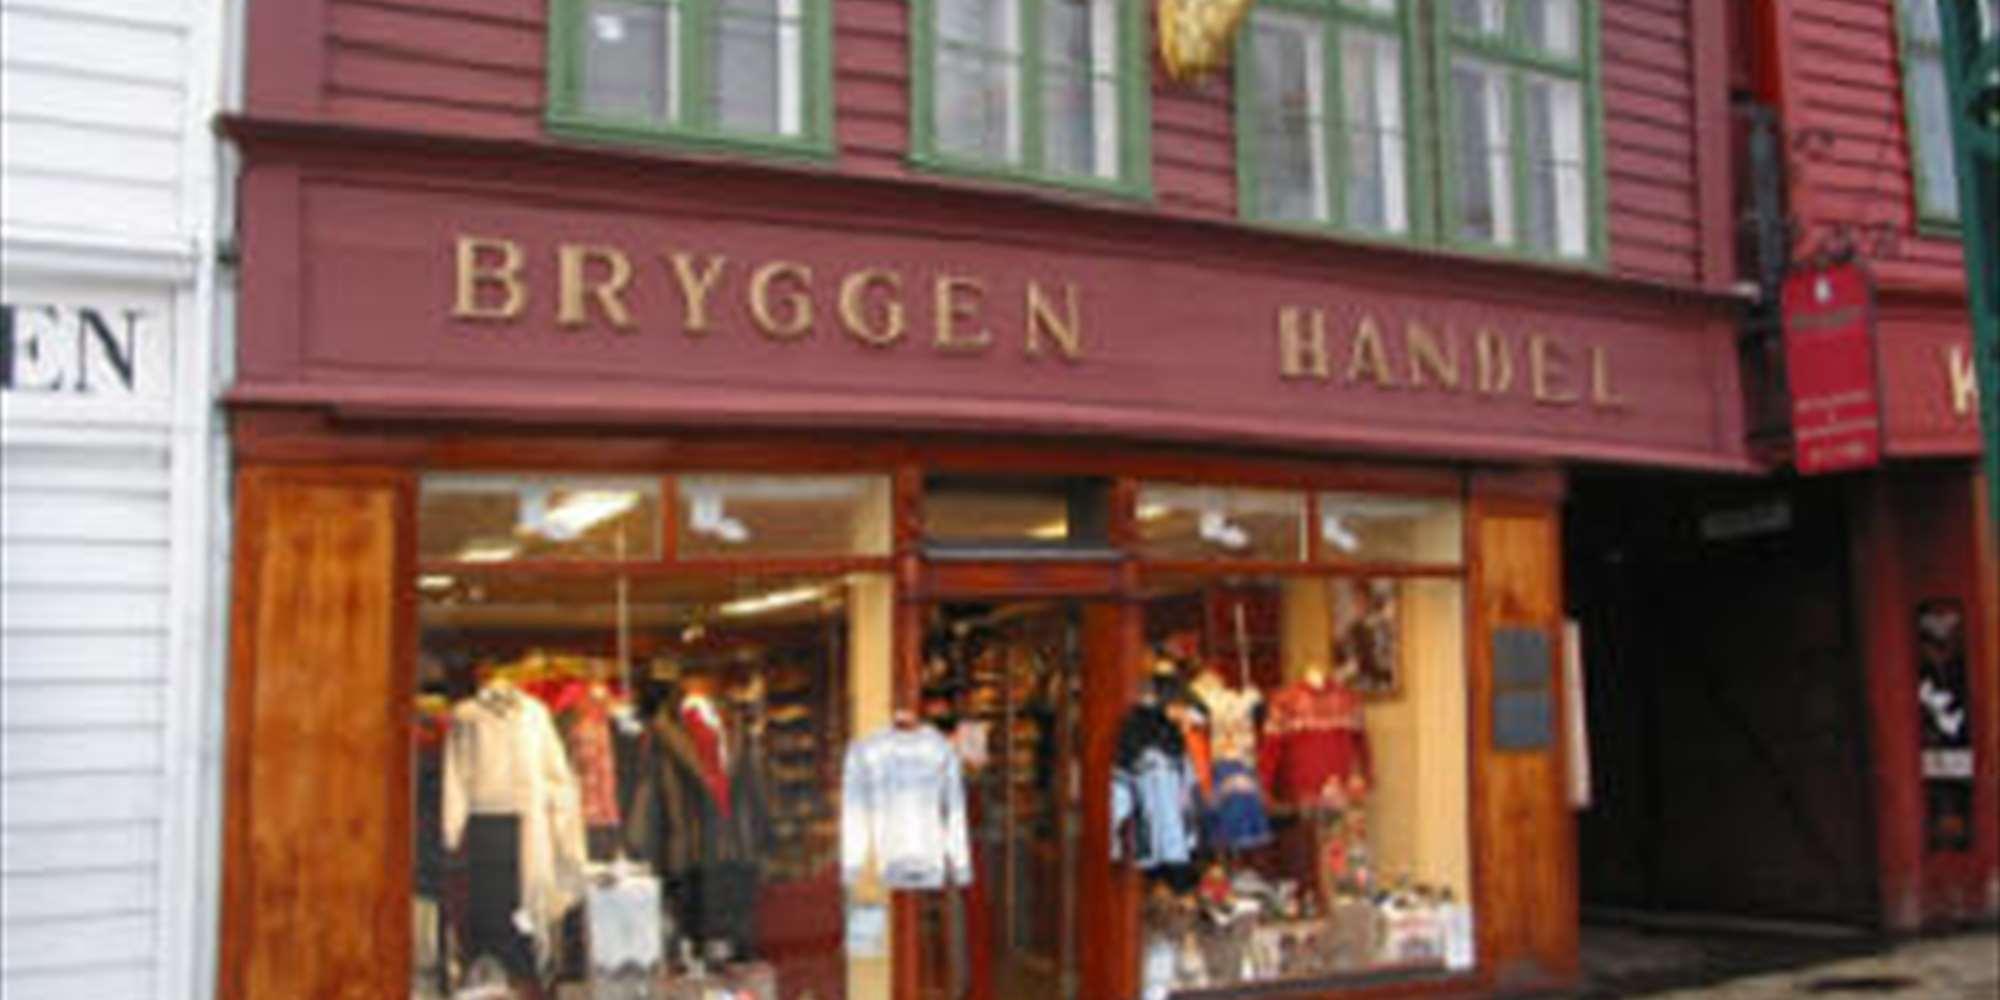 Souvenir gift shops in bergen visitbergen bryggen handel as negle Gallery